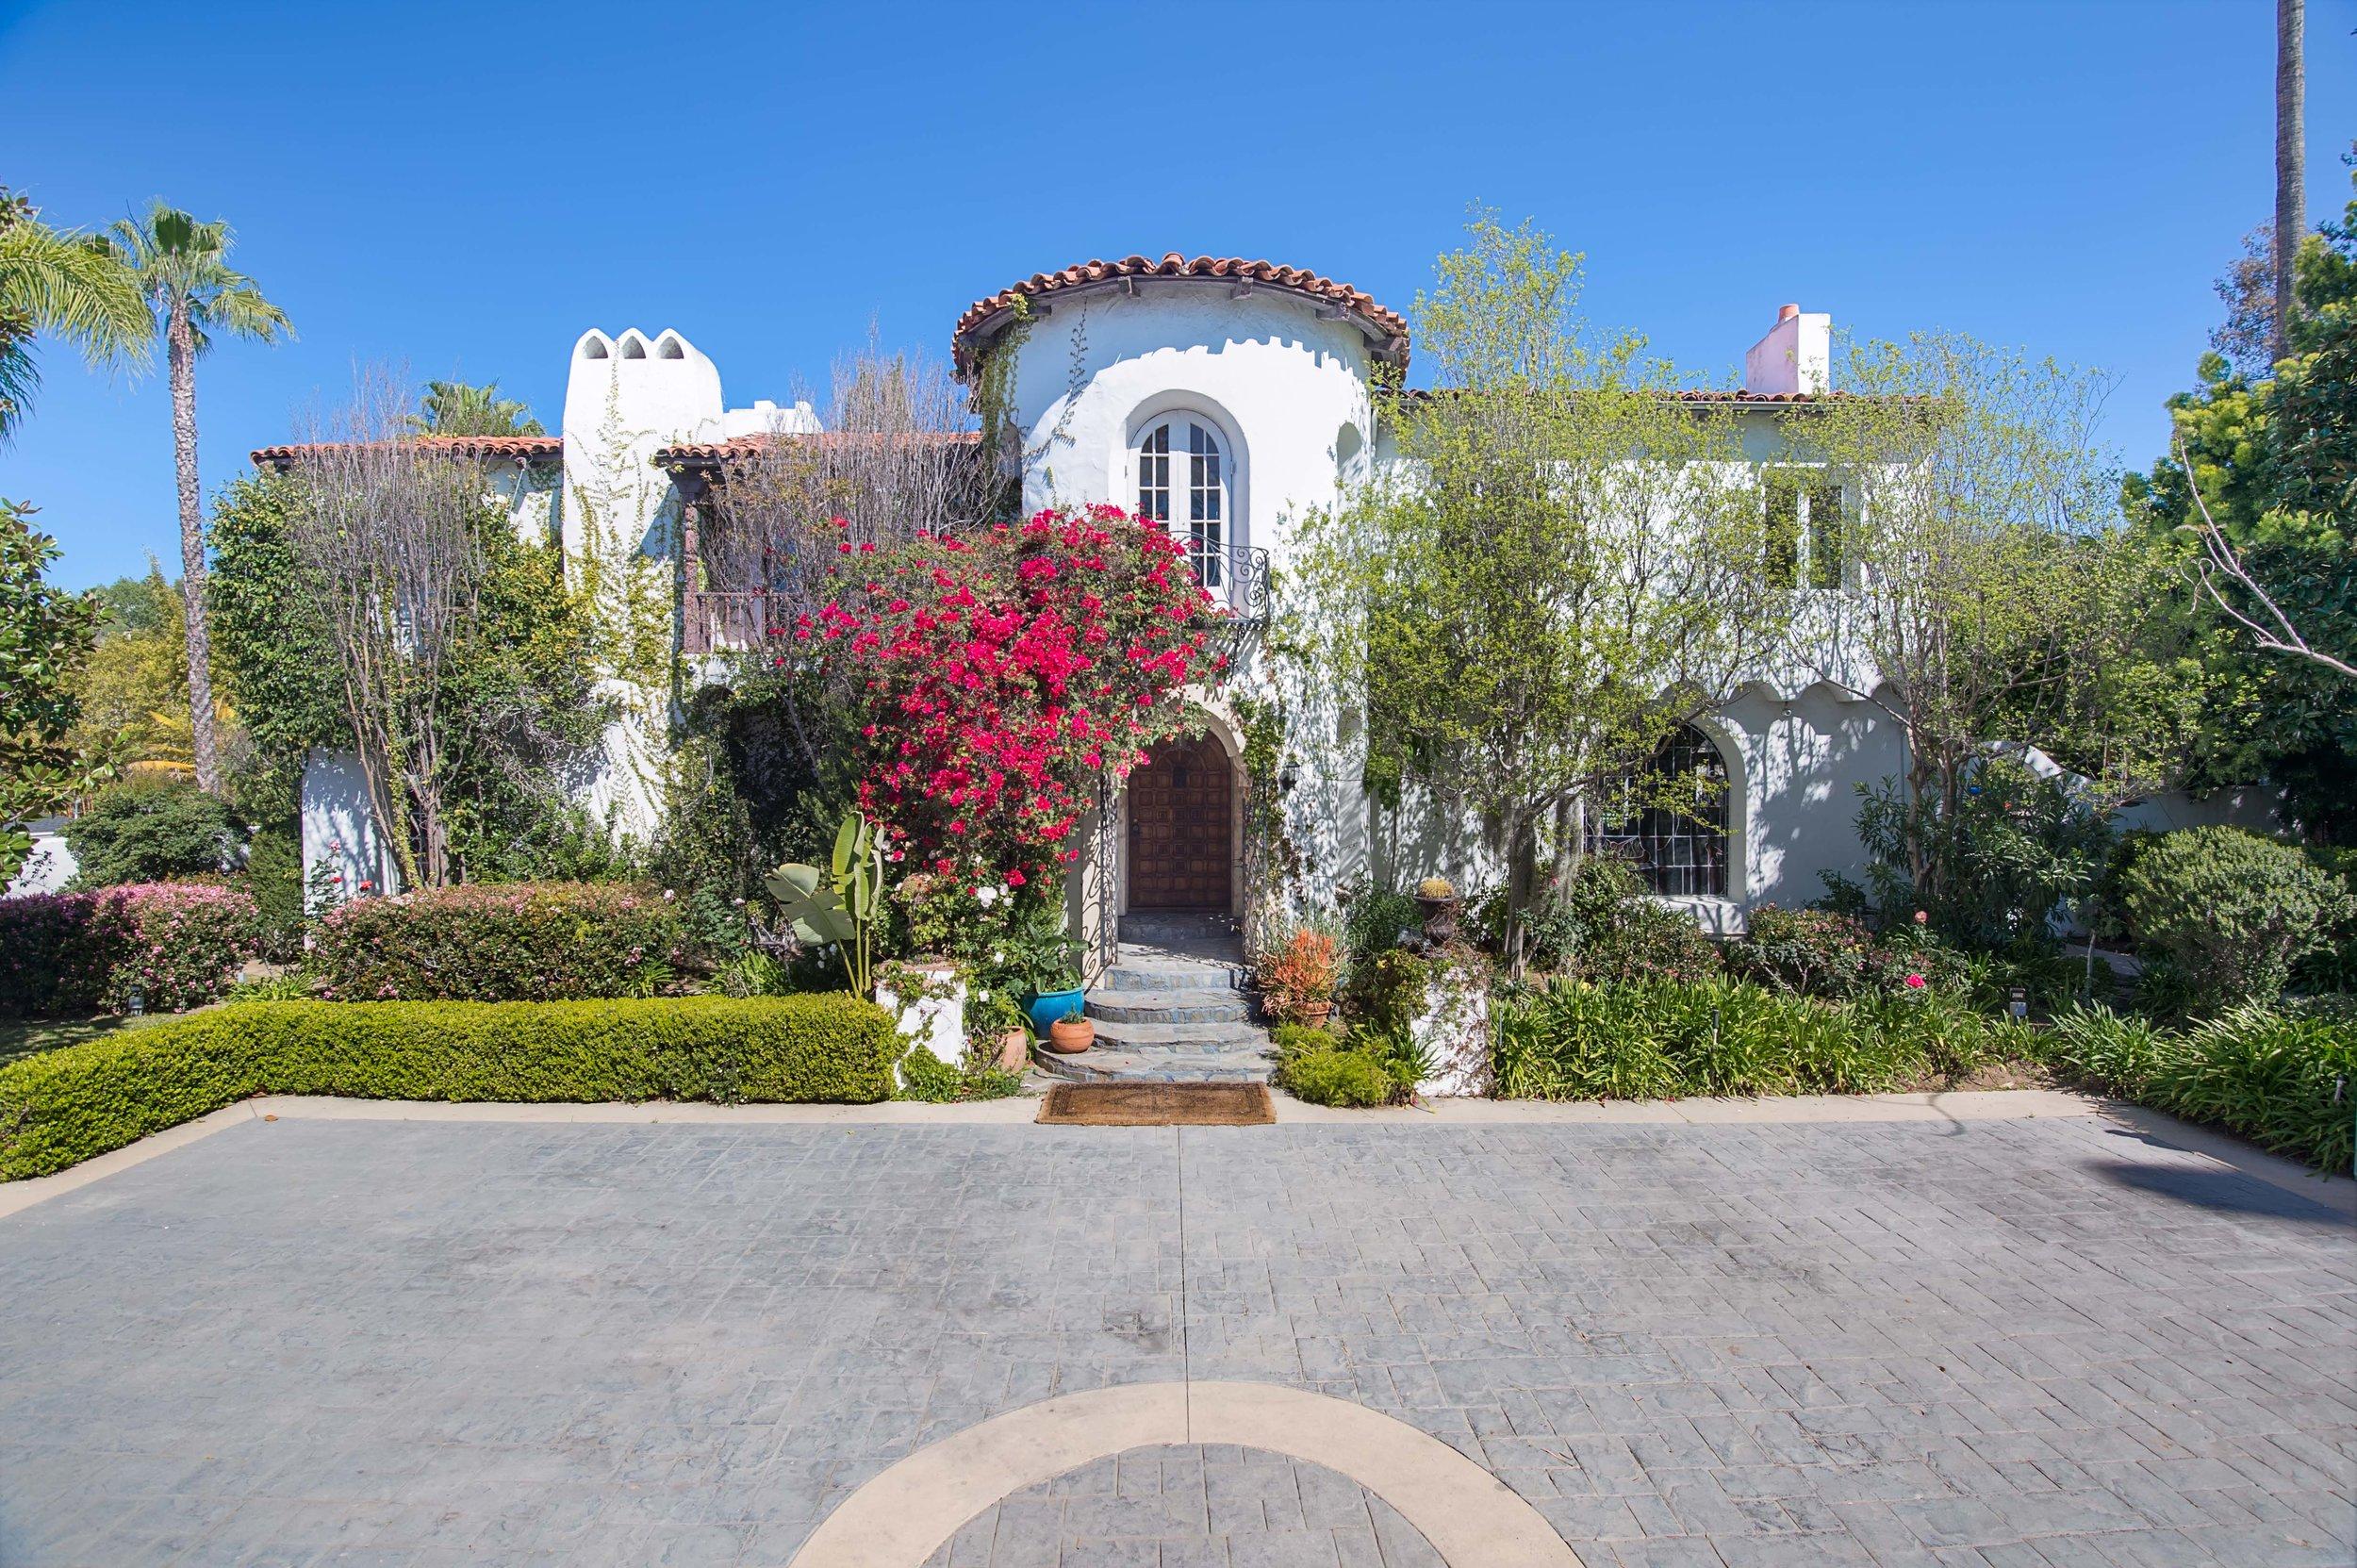 001 Front 006 Pool 4915 Los Feliz For Sale Los Angeles Lease The Malibu Life Team Luxury Real Estate.jpg